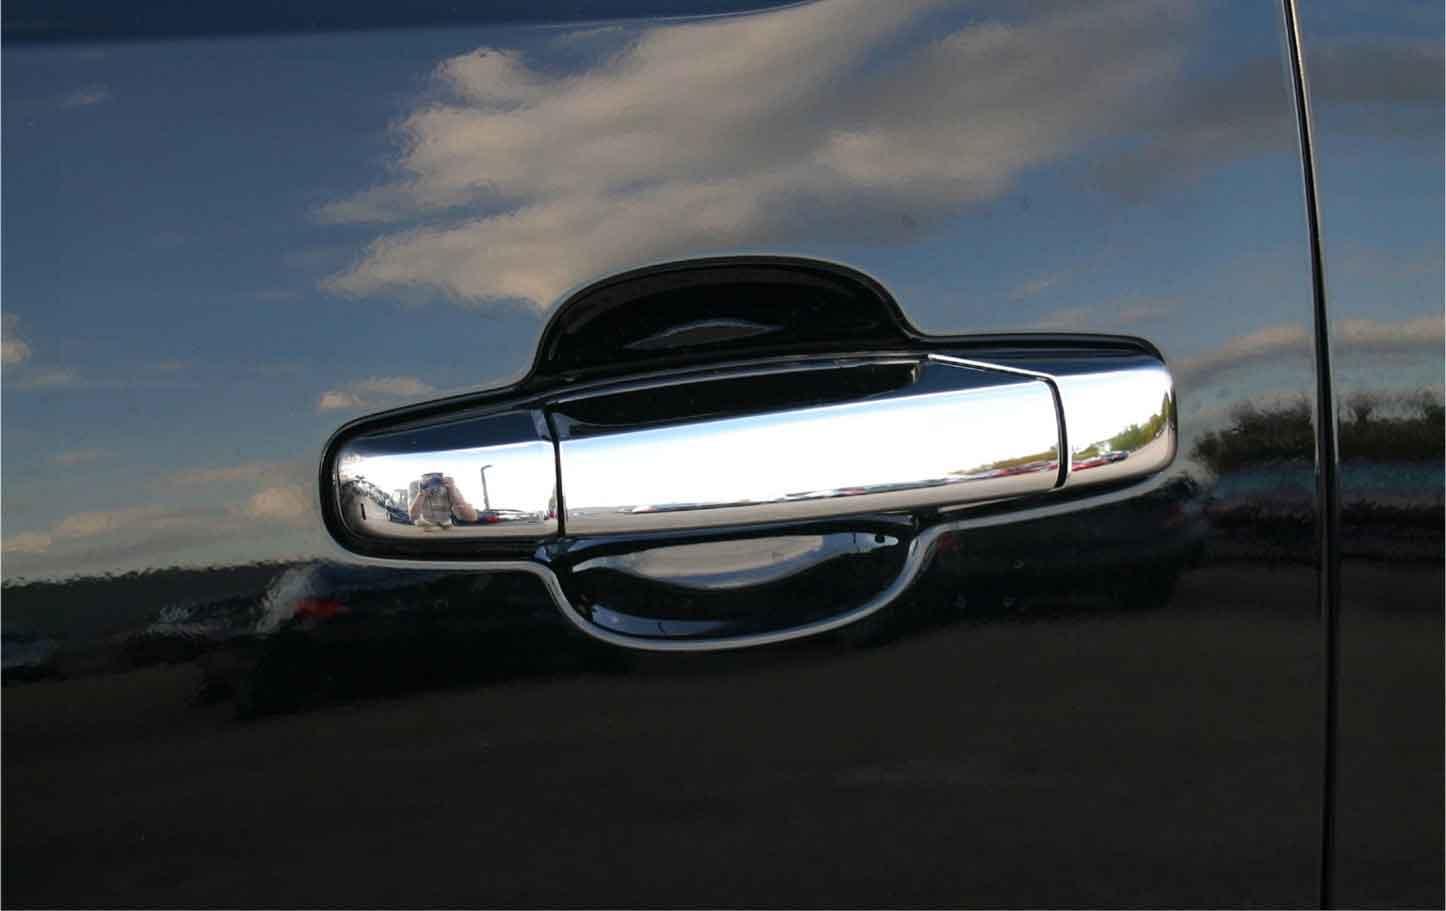 Chevy Tahoe Chrome Door Handle Cover Trim